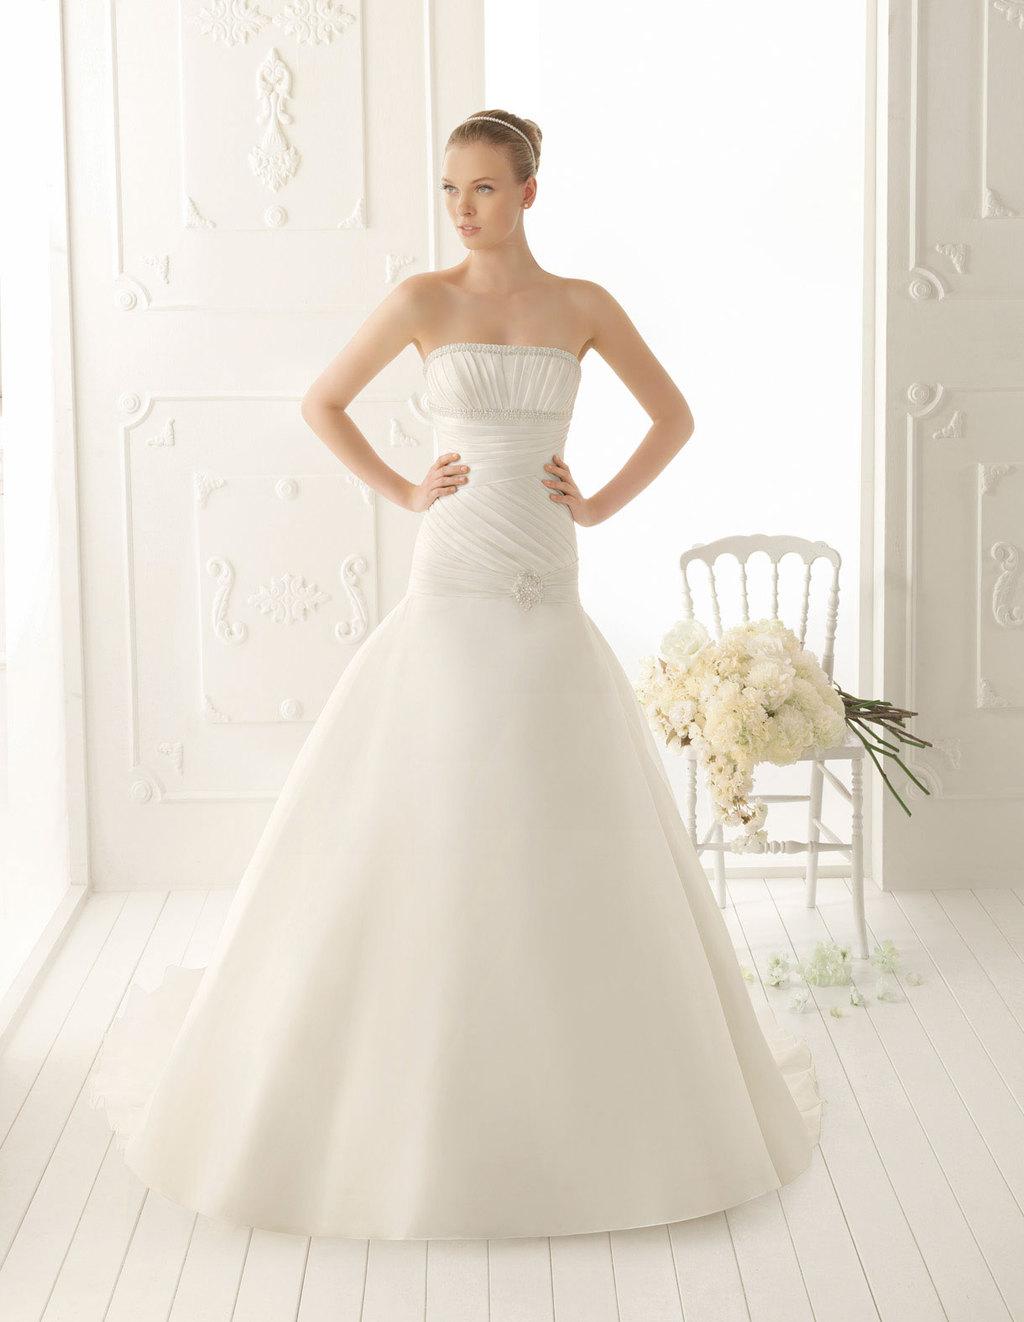 Aire-barcelona-wedding-dress-2013-vintage-bridal-collection-vega.full